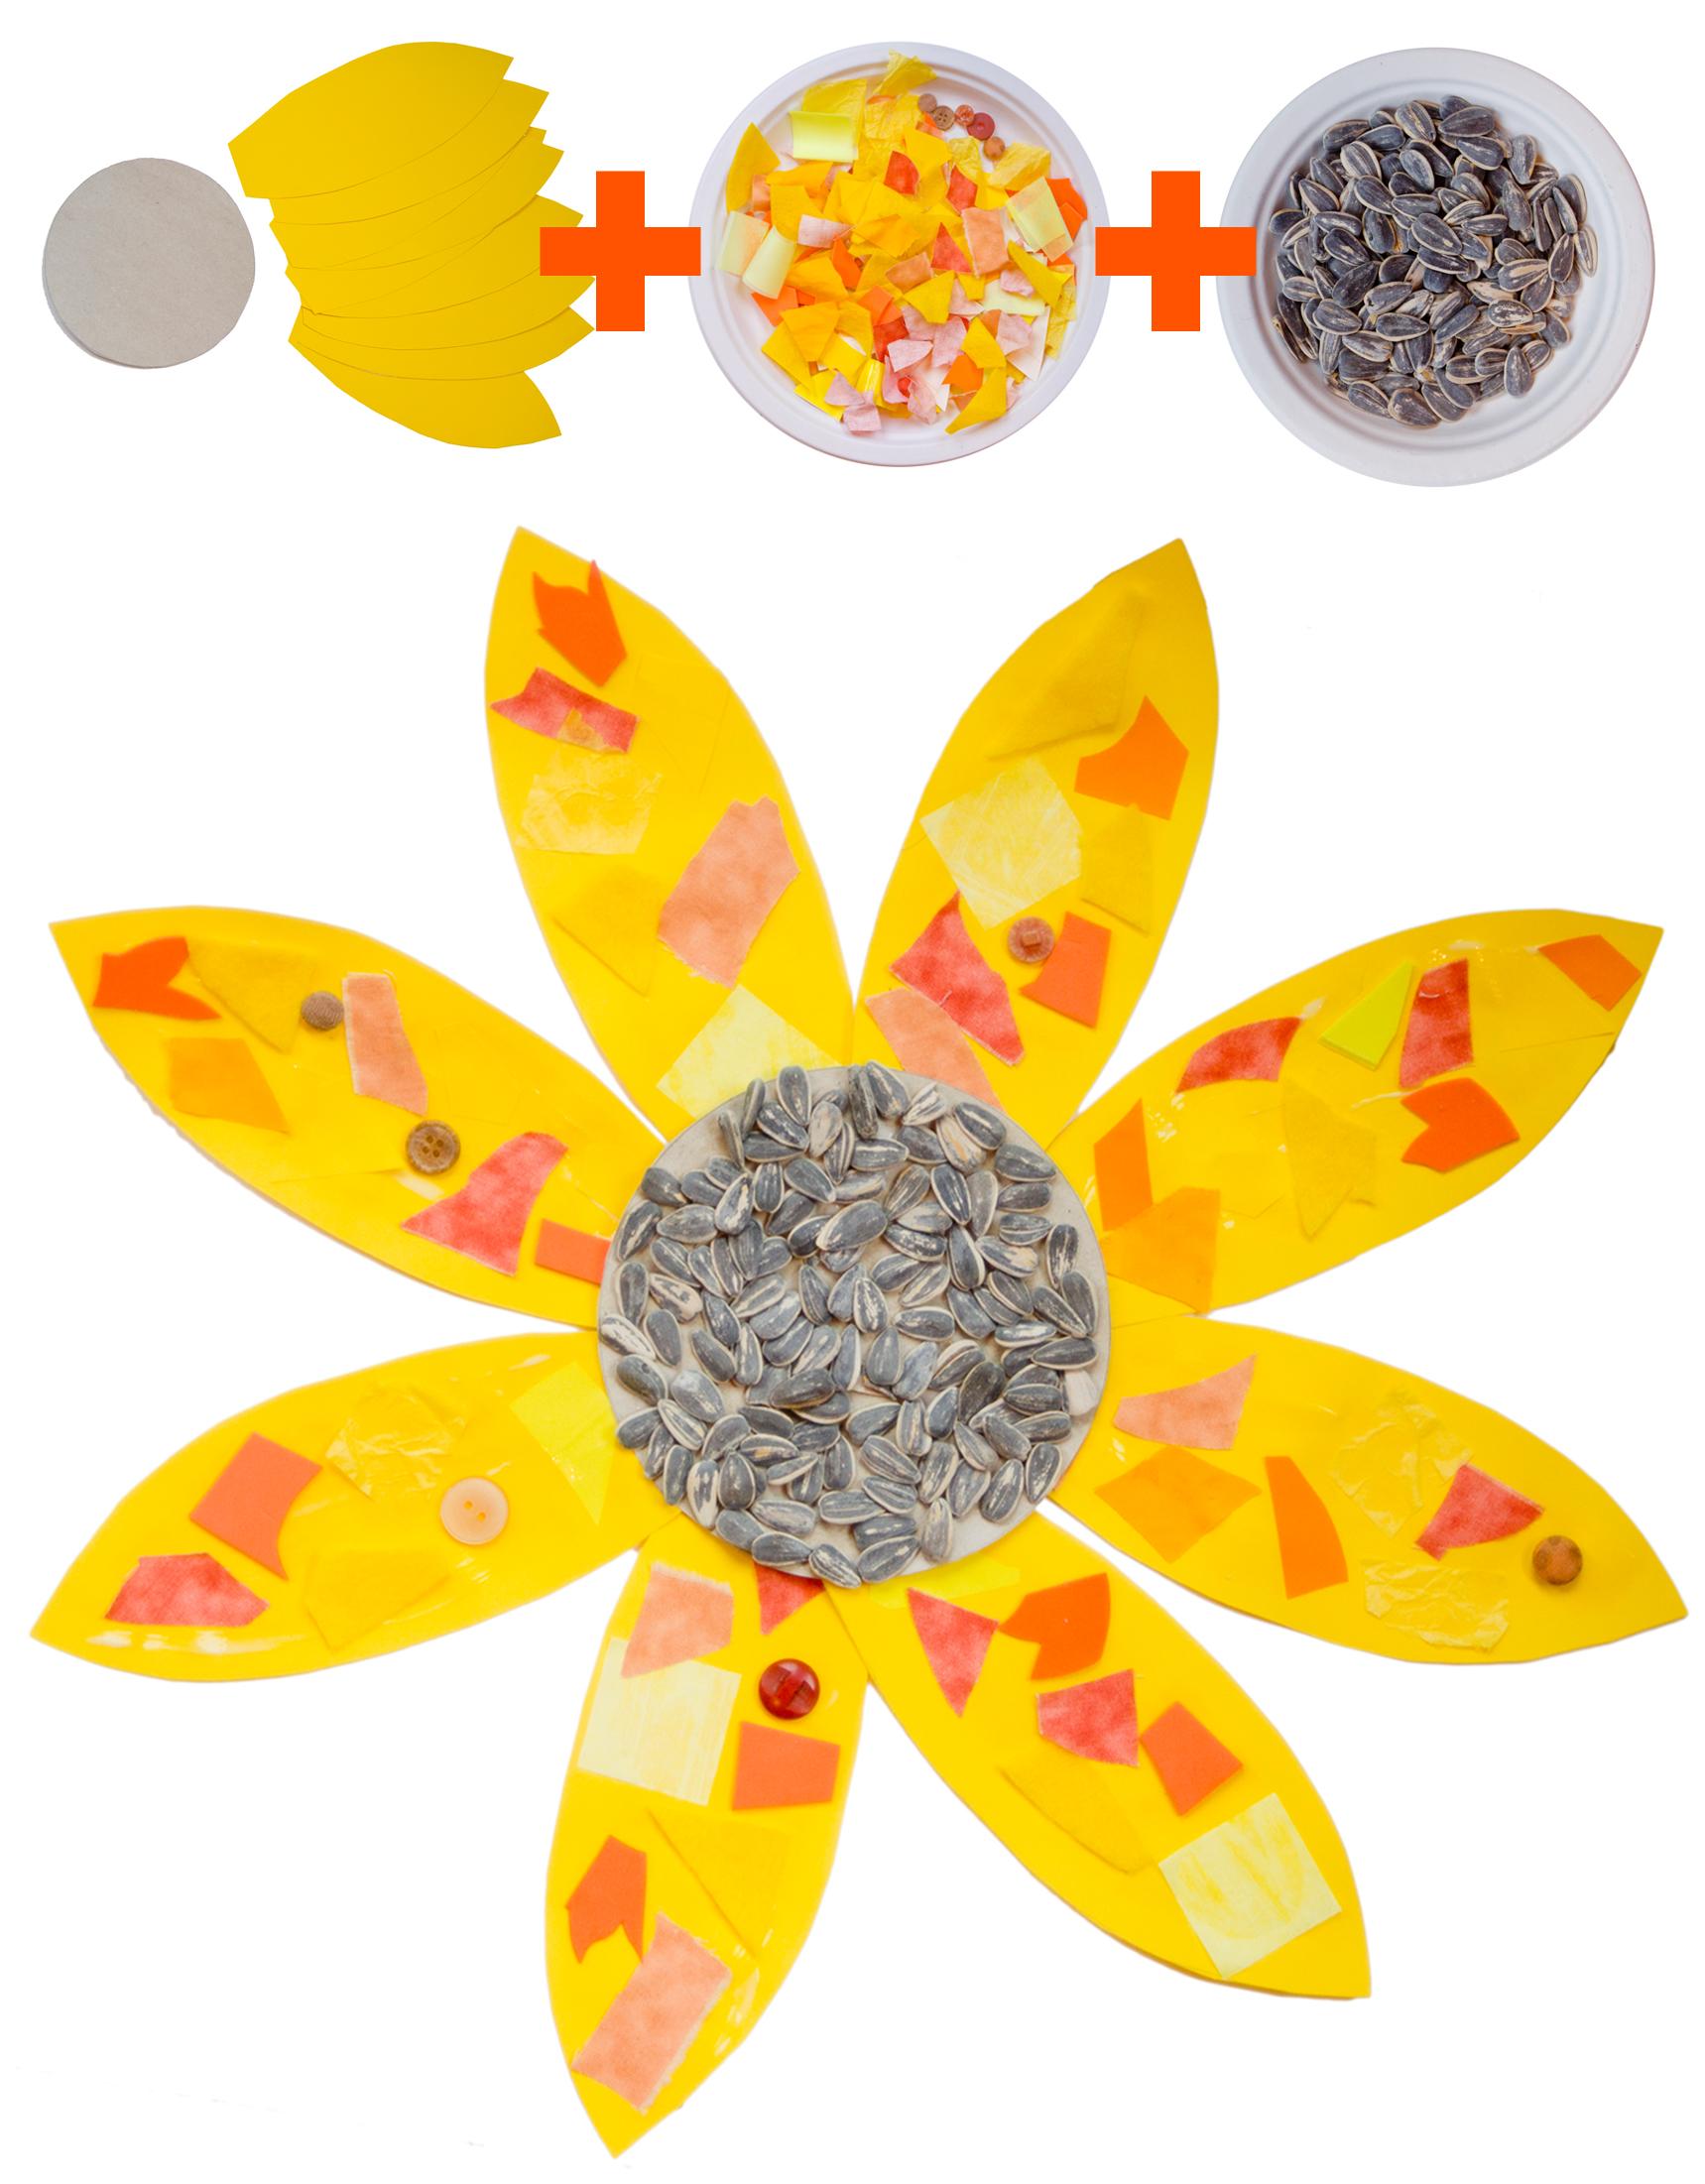 Van Gogh S Sunflower Collage Version For Preschoolers